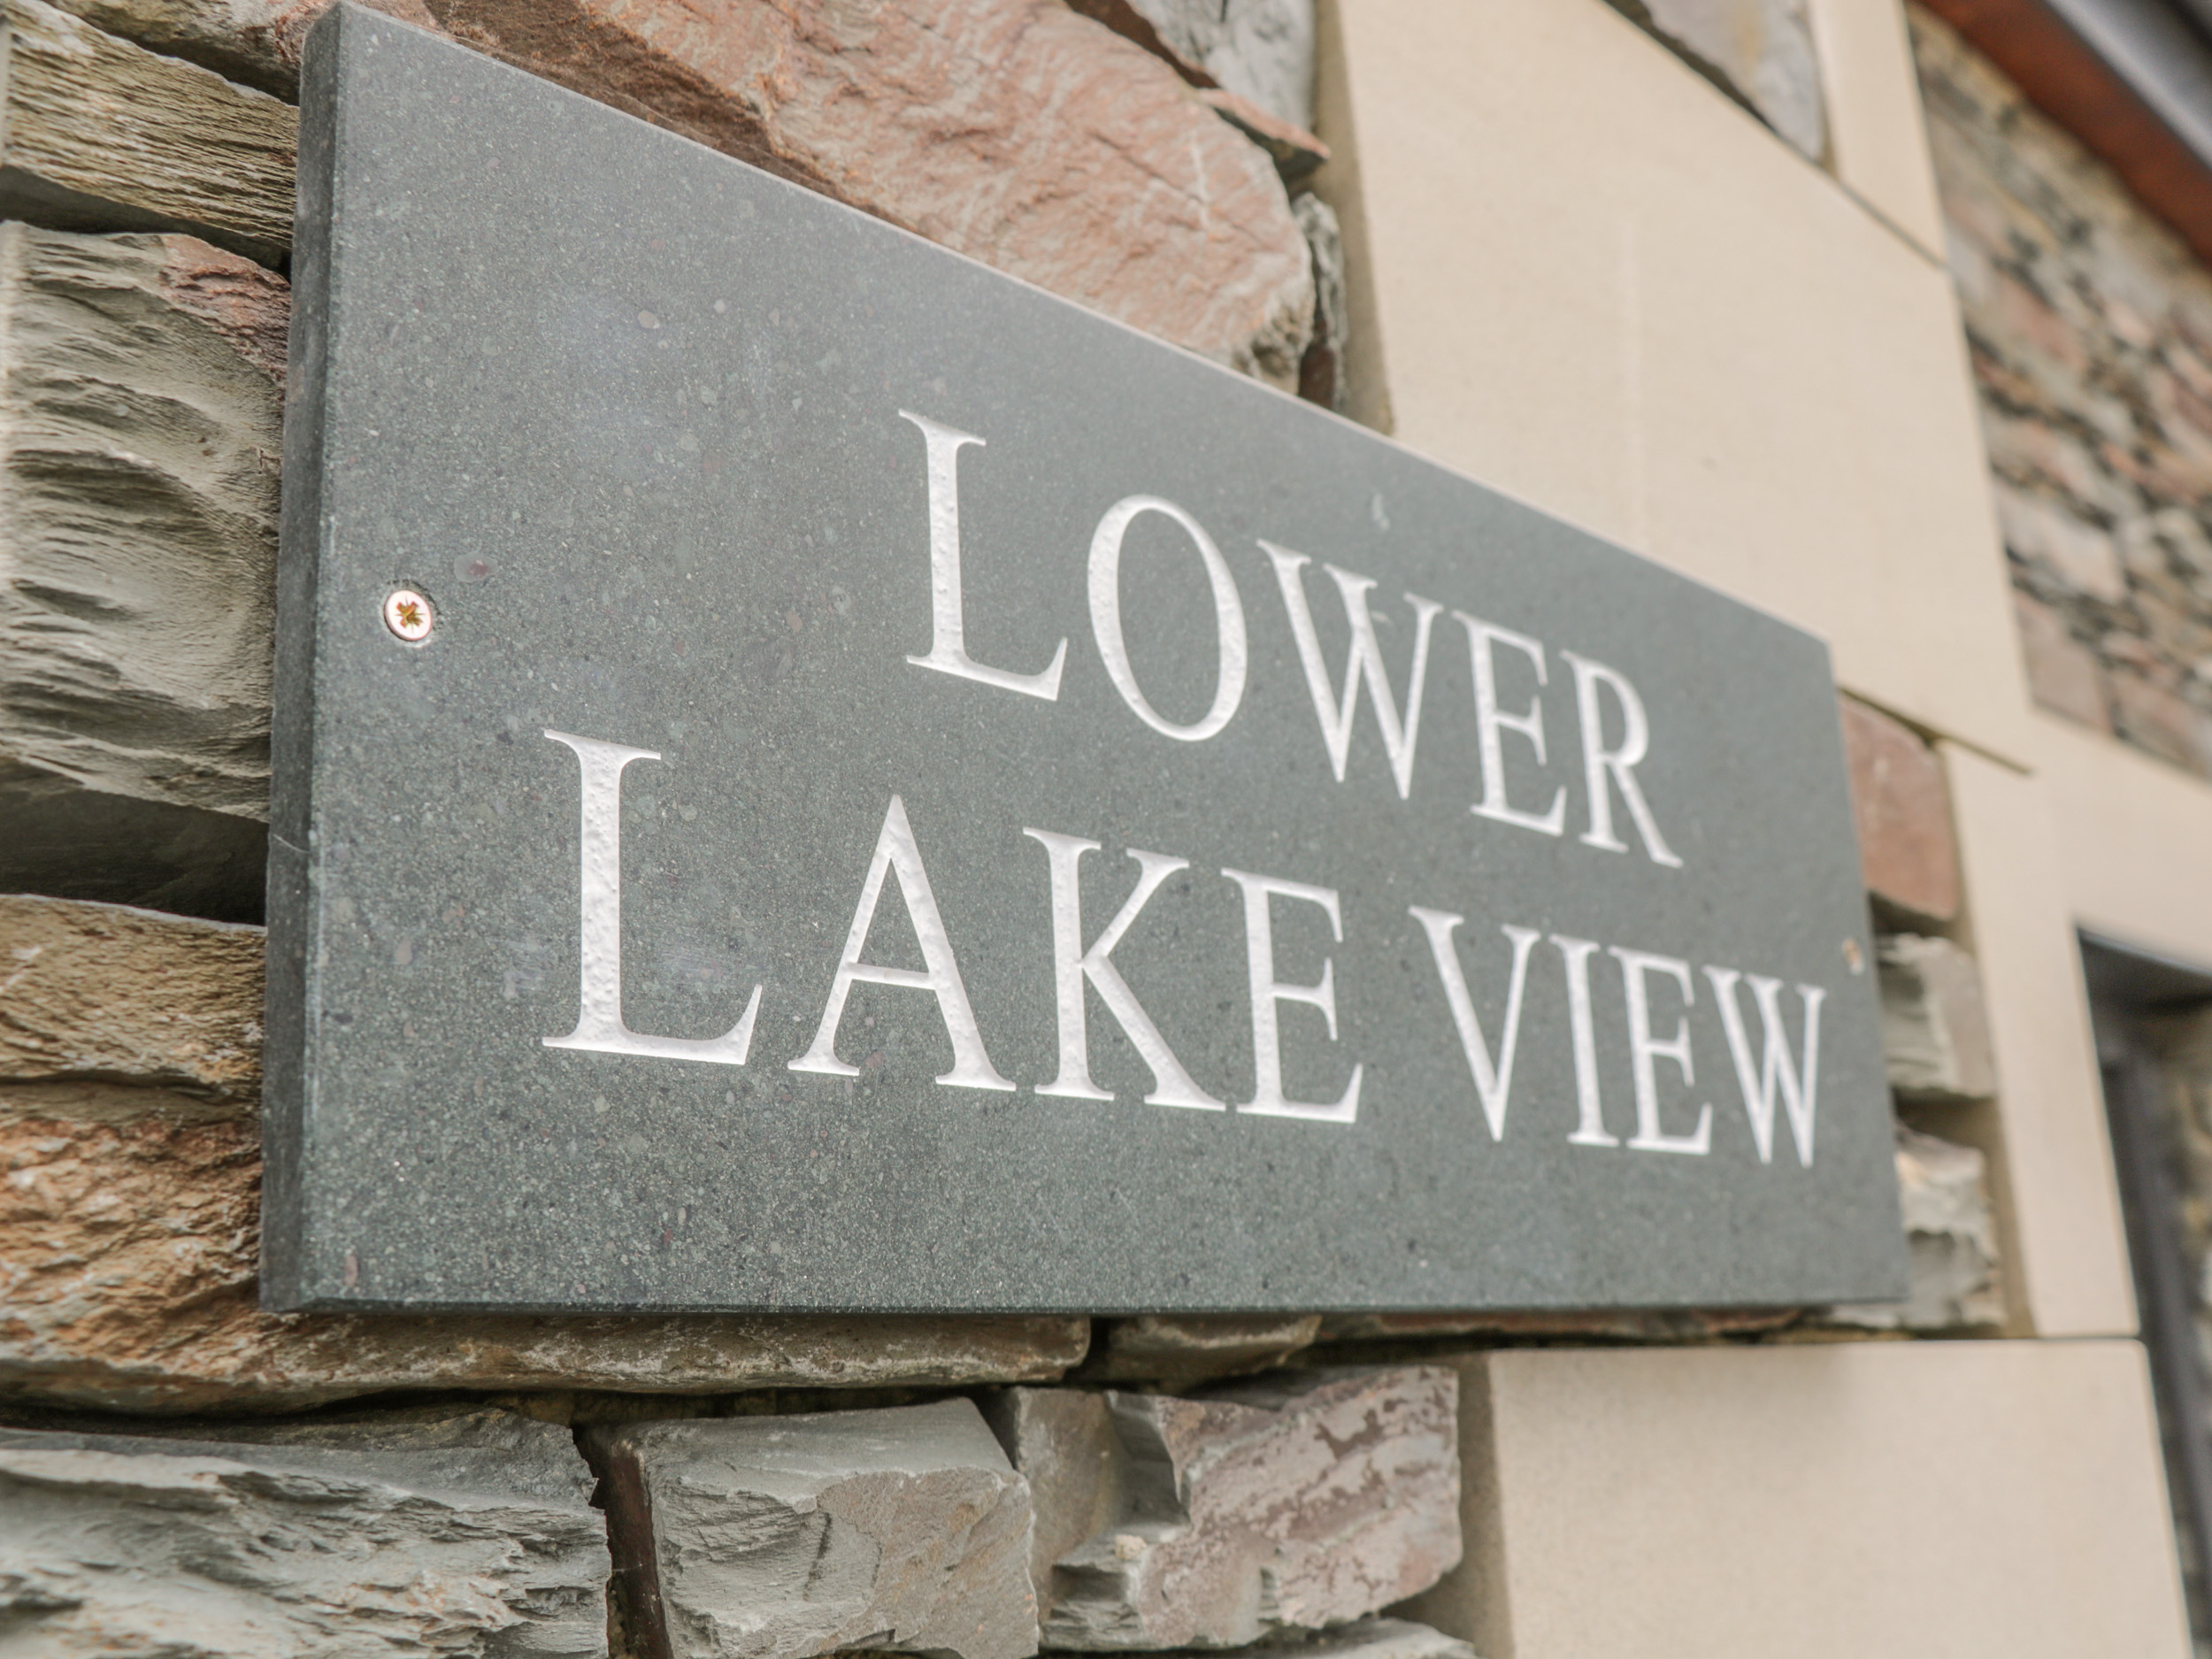 Lower Lake View